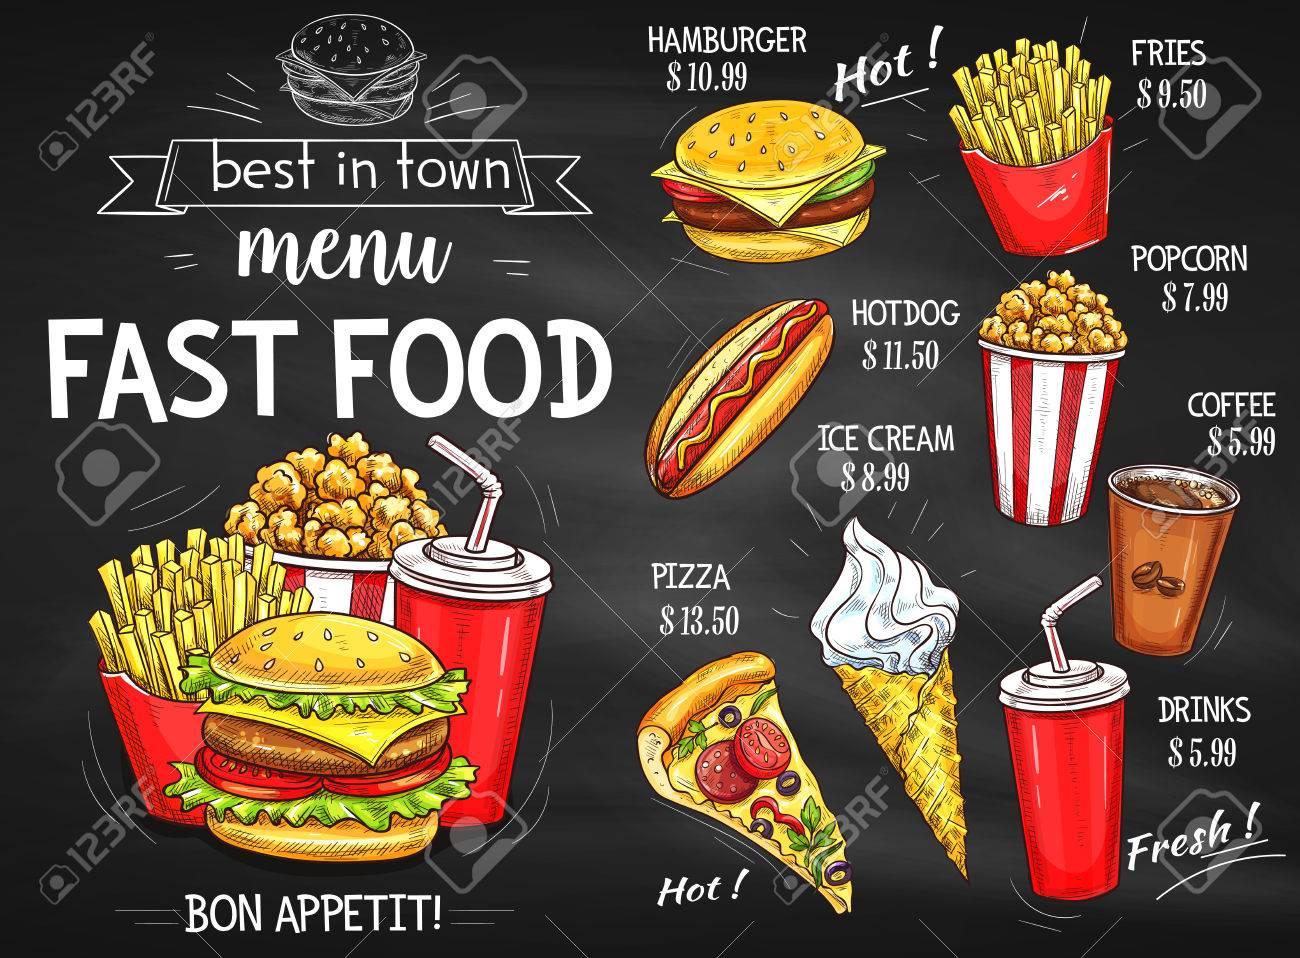 Fast food restaurant menu chalkboard design - 75310109